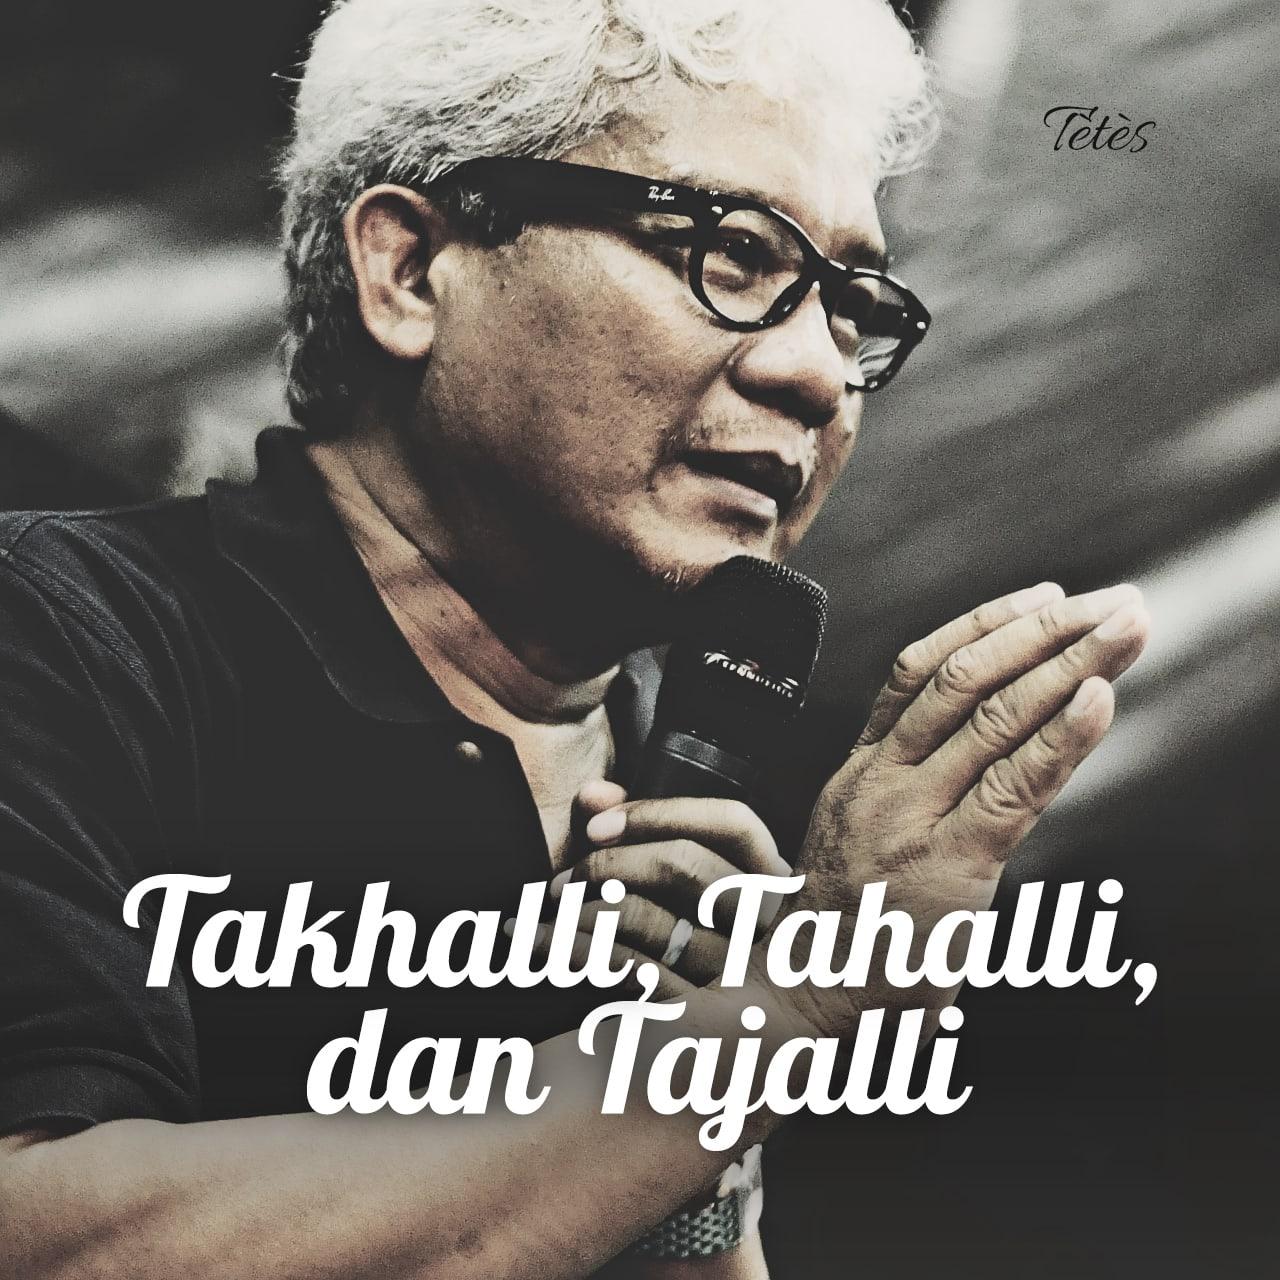 Takhalli, Tahalli, dan Tajalli